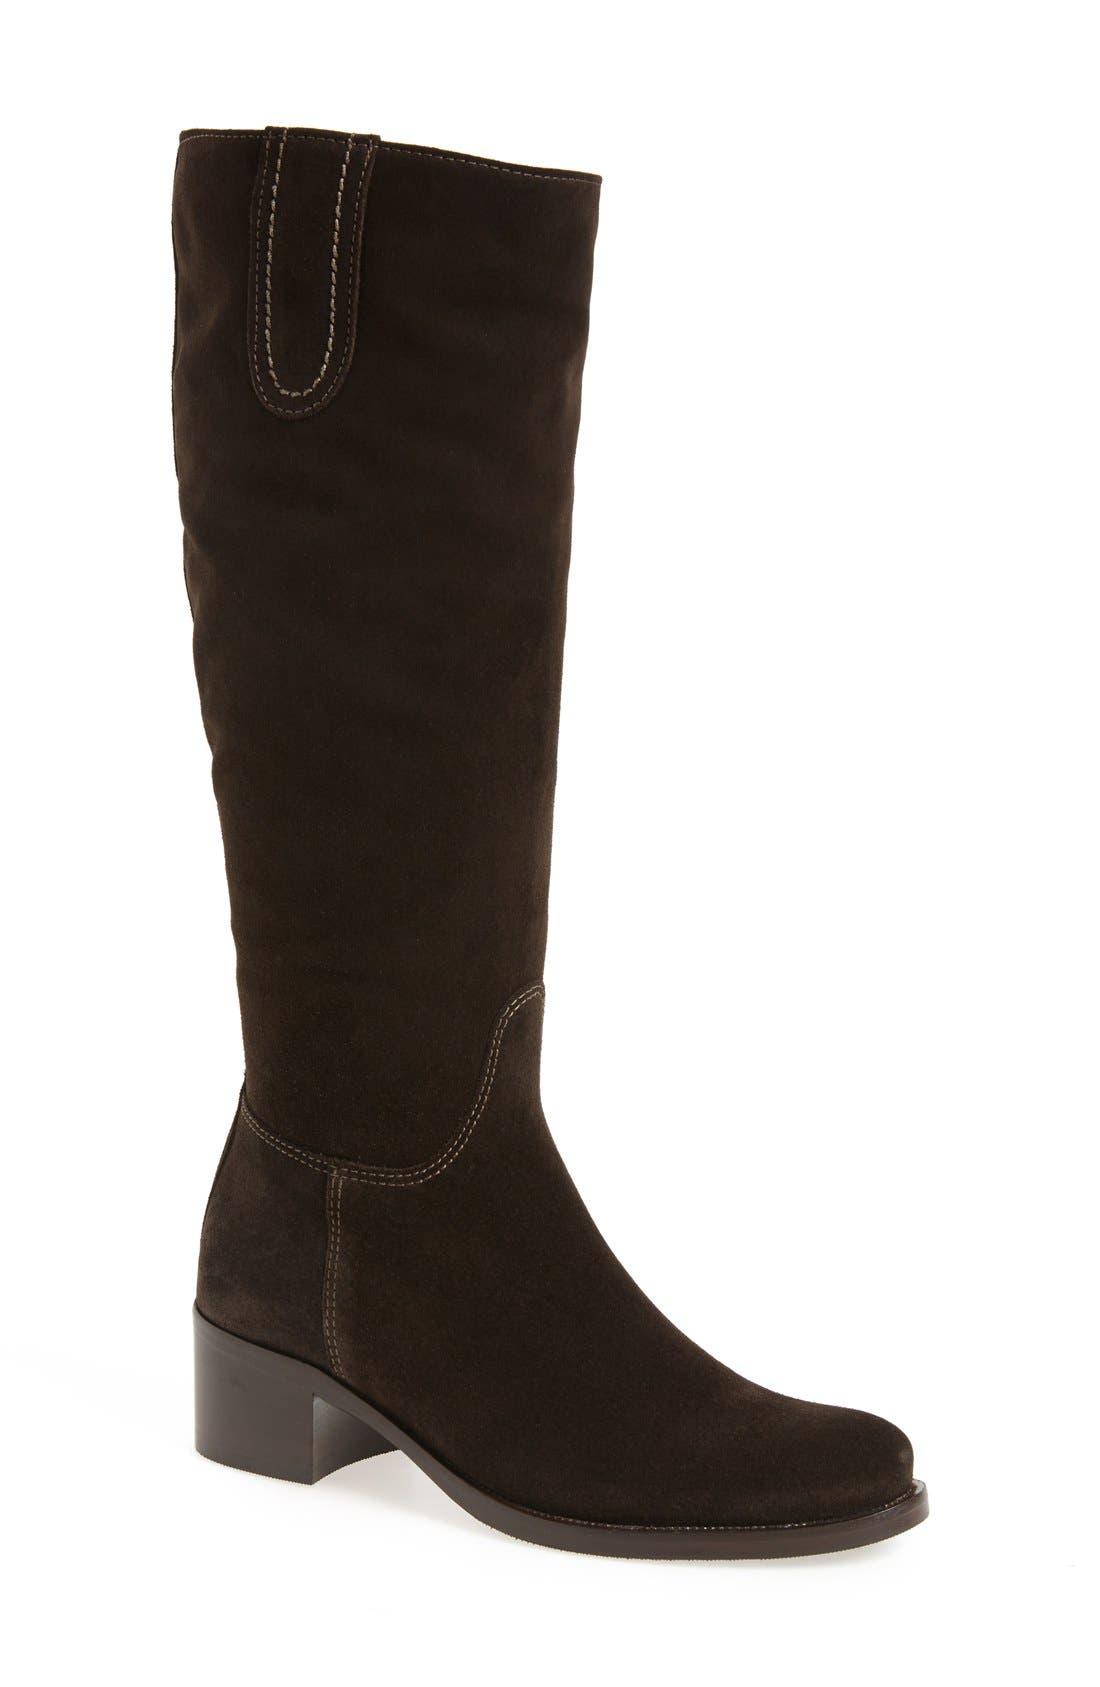 Main Image - La Canadienne 'Polly' Waterproof Knee High Boot (Women)